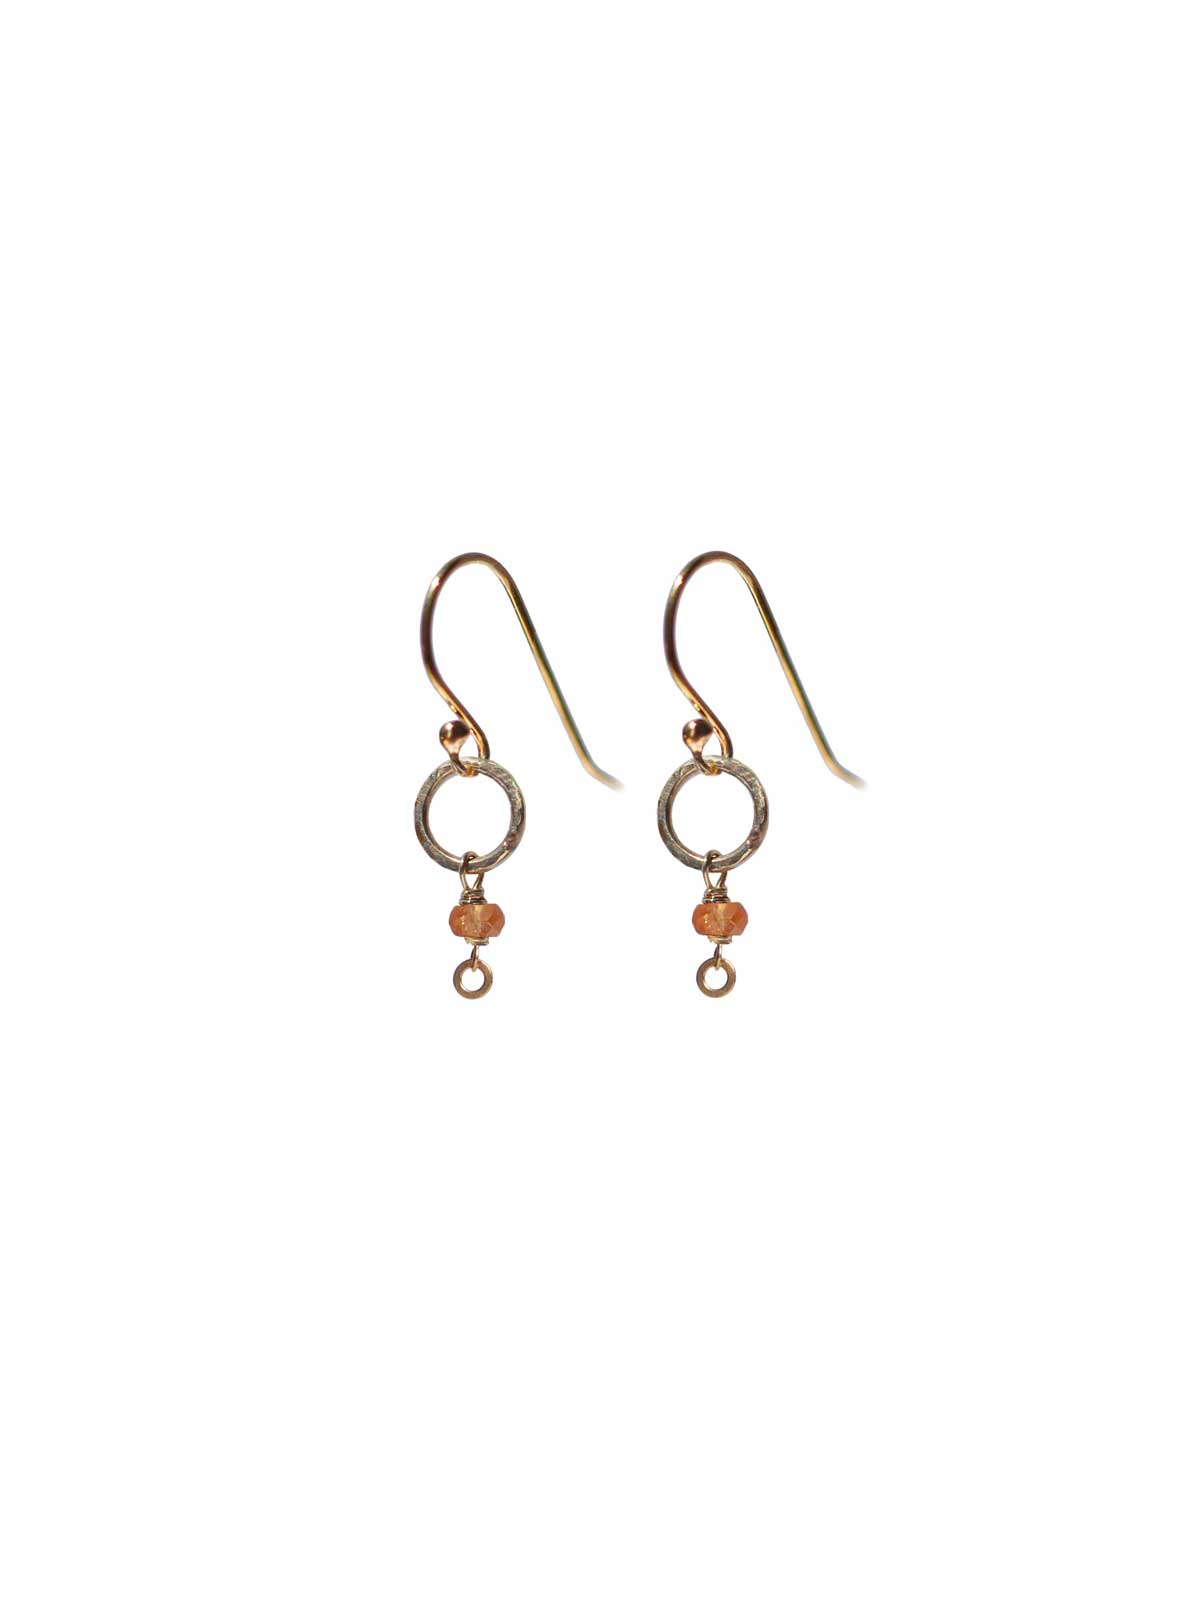 Earrings Gold-filled 14 Karat and Yellow/Orange Sapphire